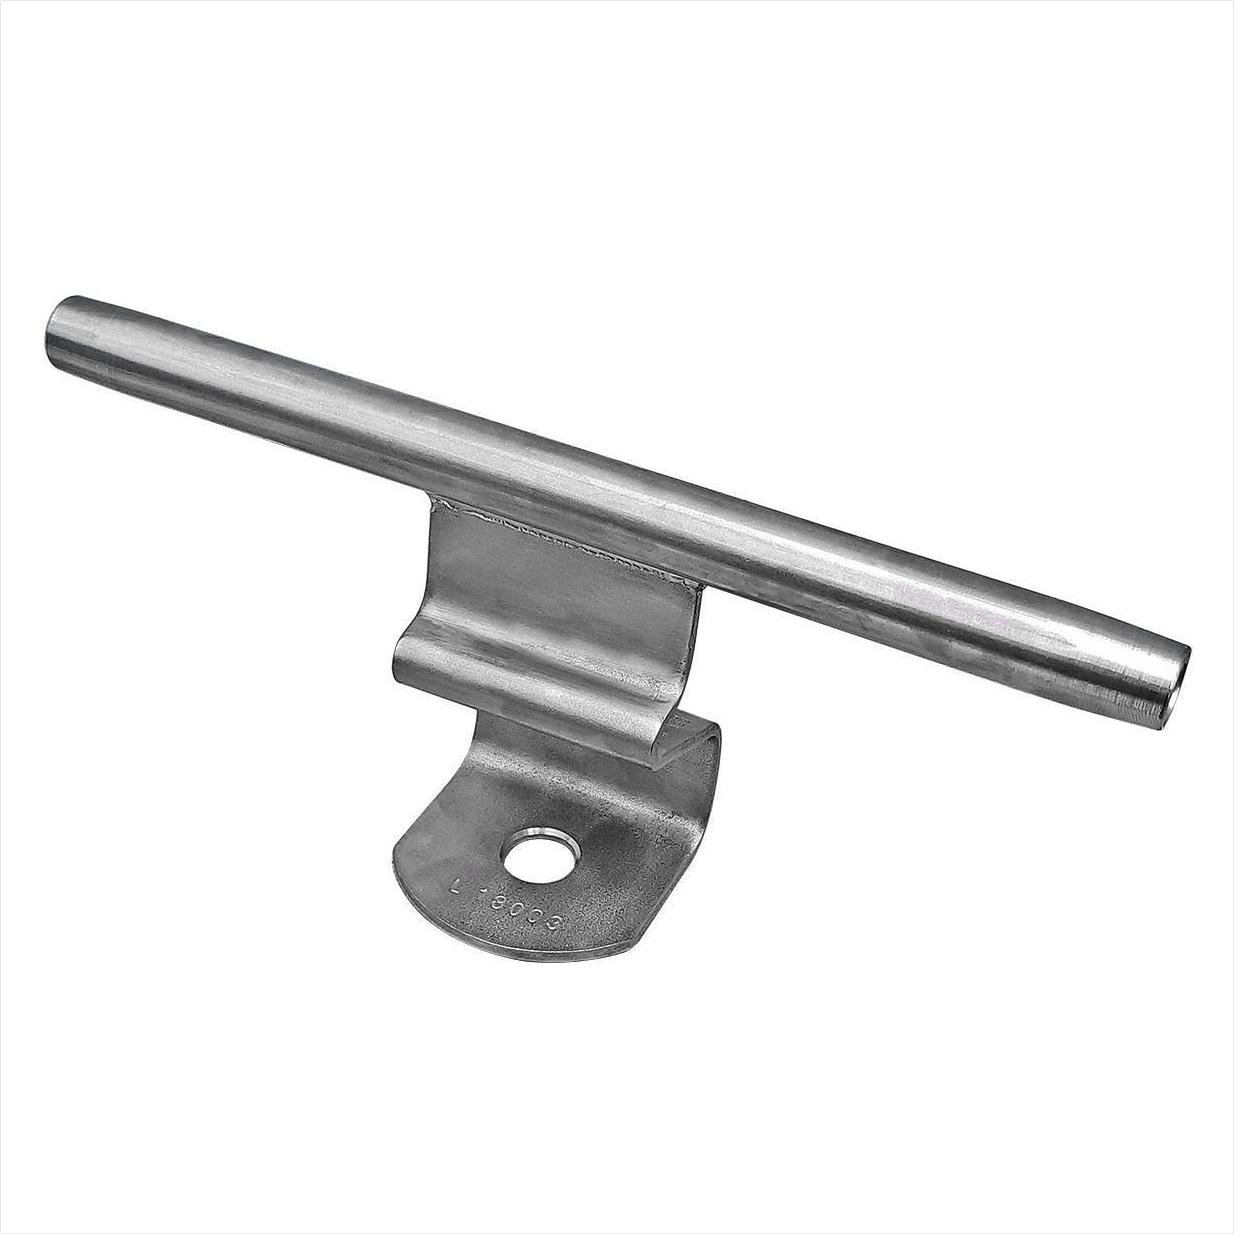 Trilho Ancoragem Intermediária inox InterLoop cabo 8mm a 10mm NBR Compatível SideUp